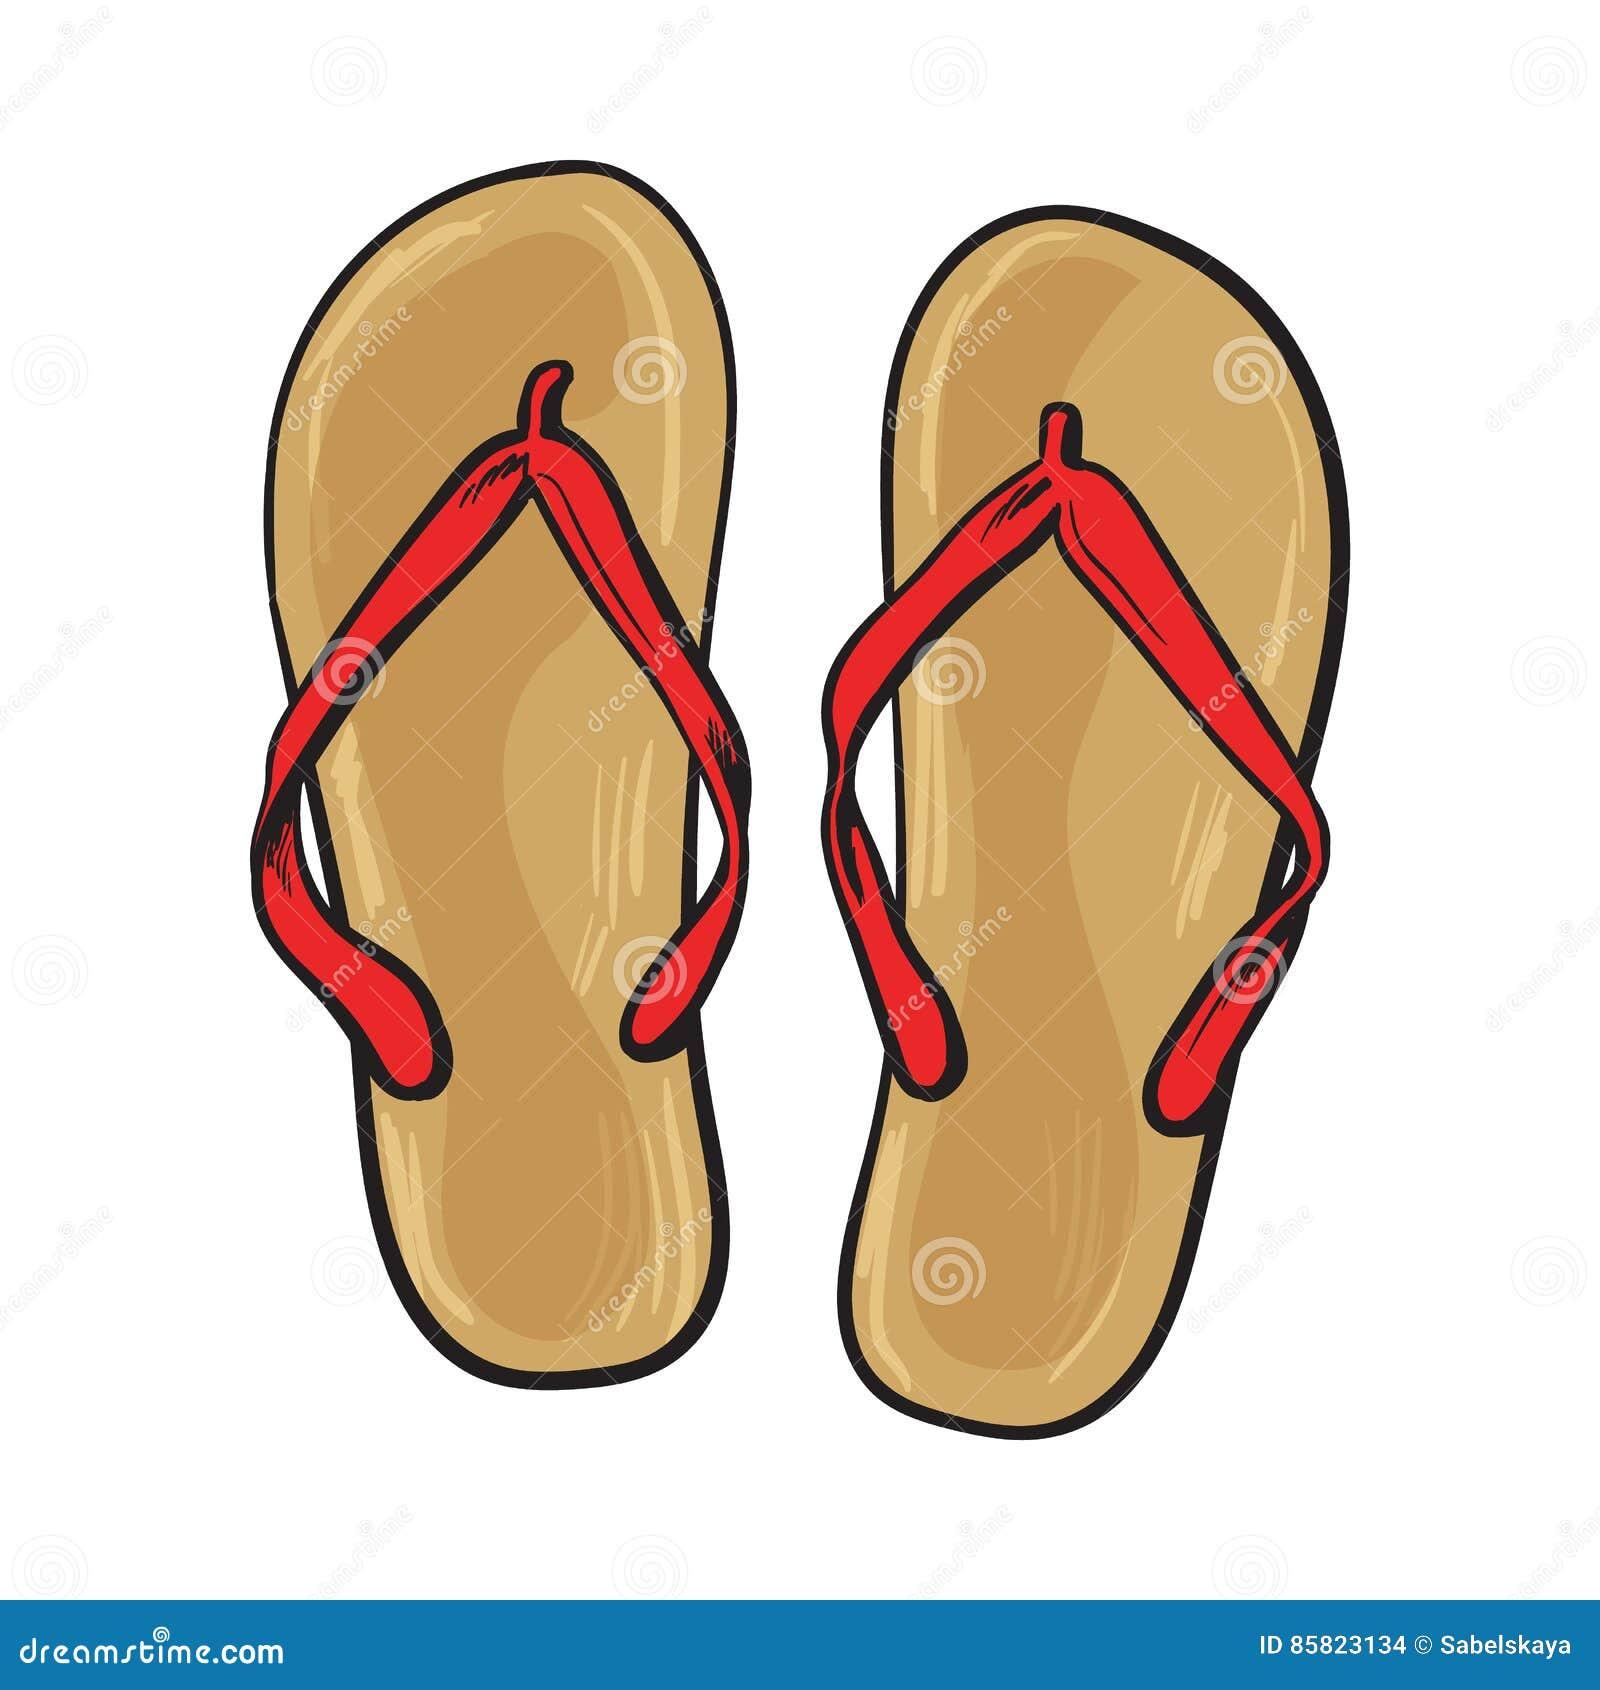 bda13949ce56 Pair Of Flip Flops